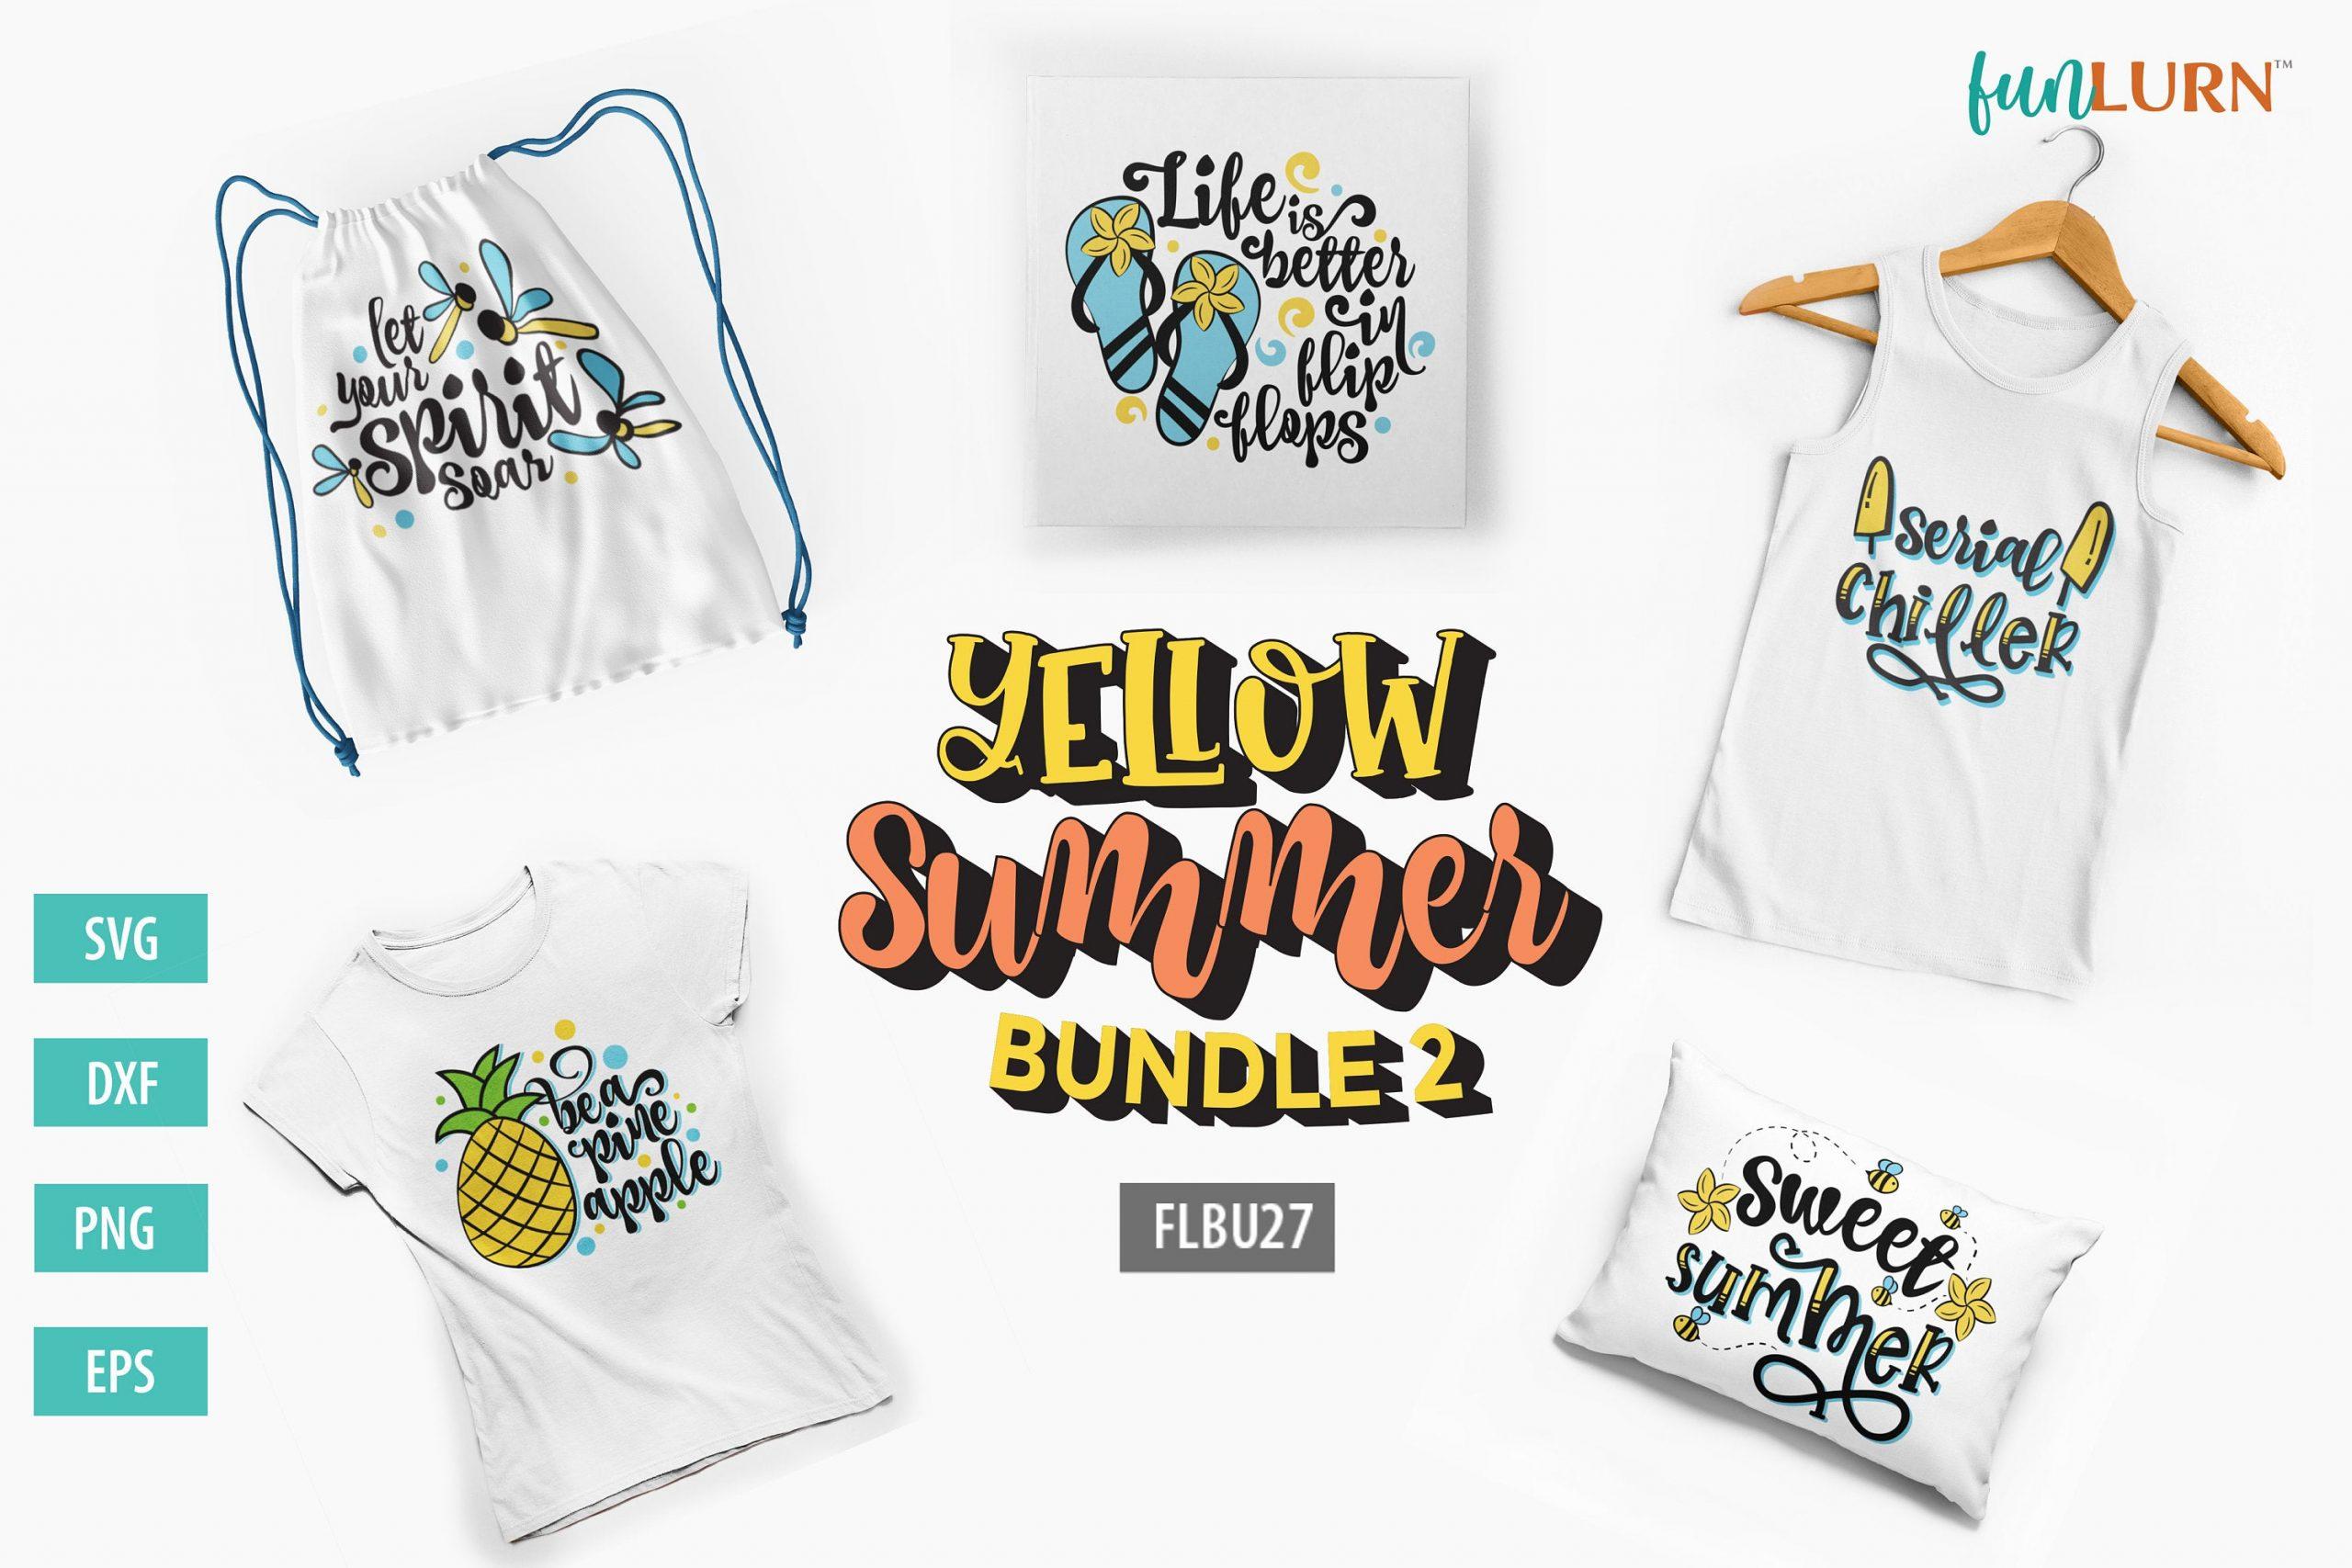 Yellow Summer Svg Bundle 2 Funlurn